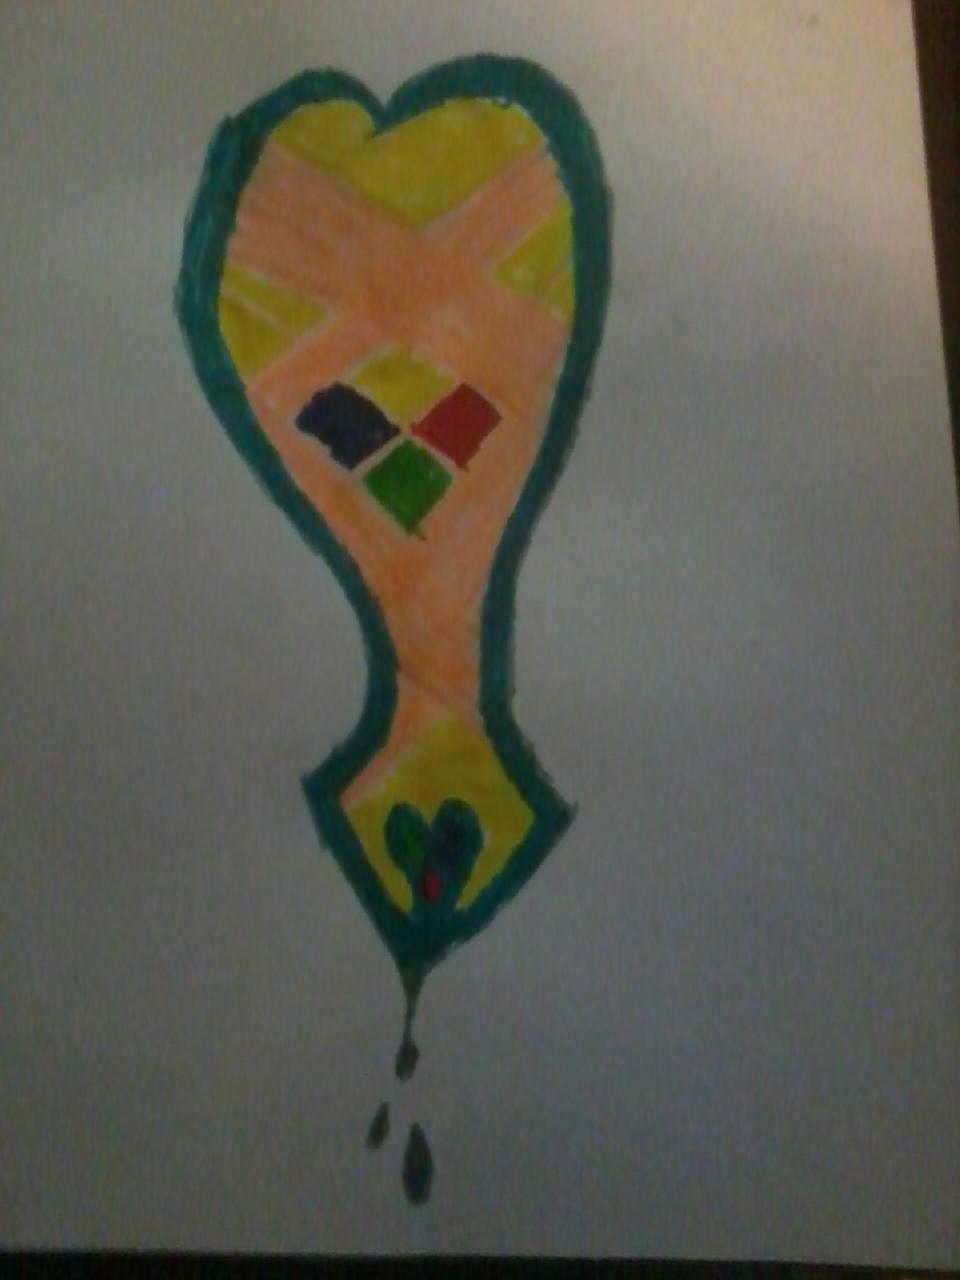 Heartless Symbol?